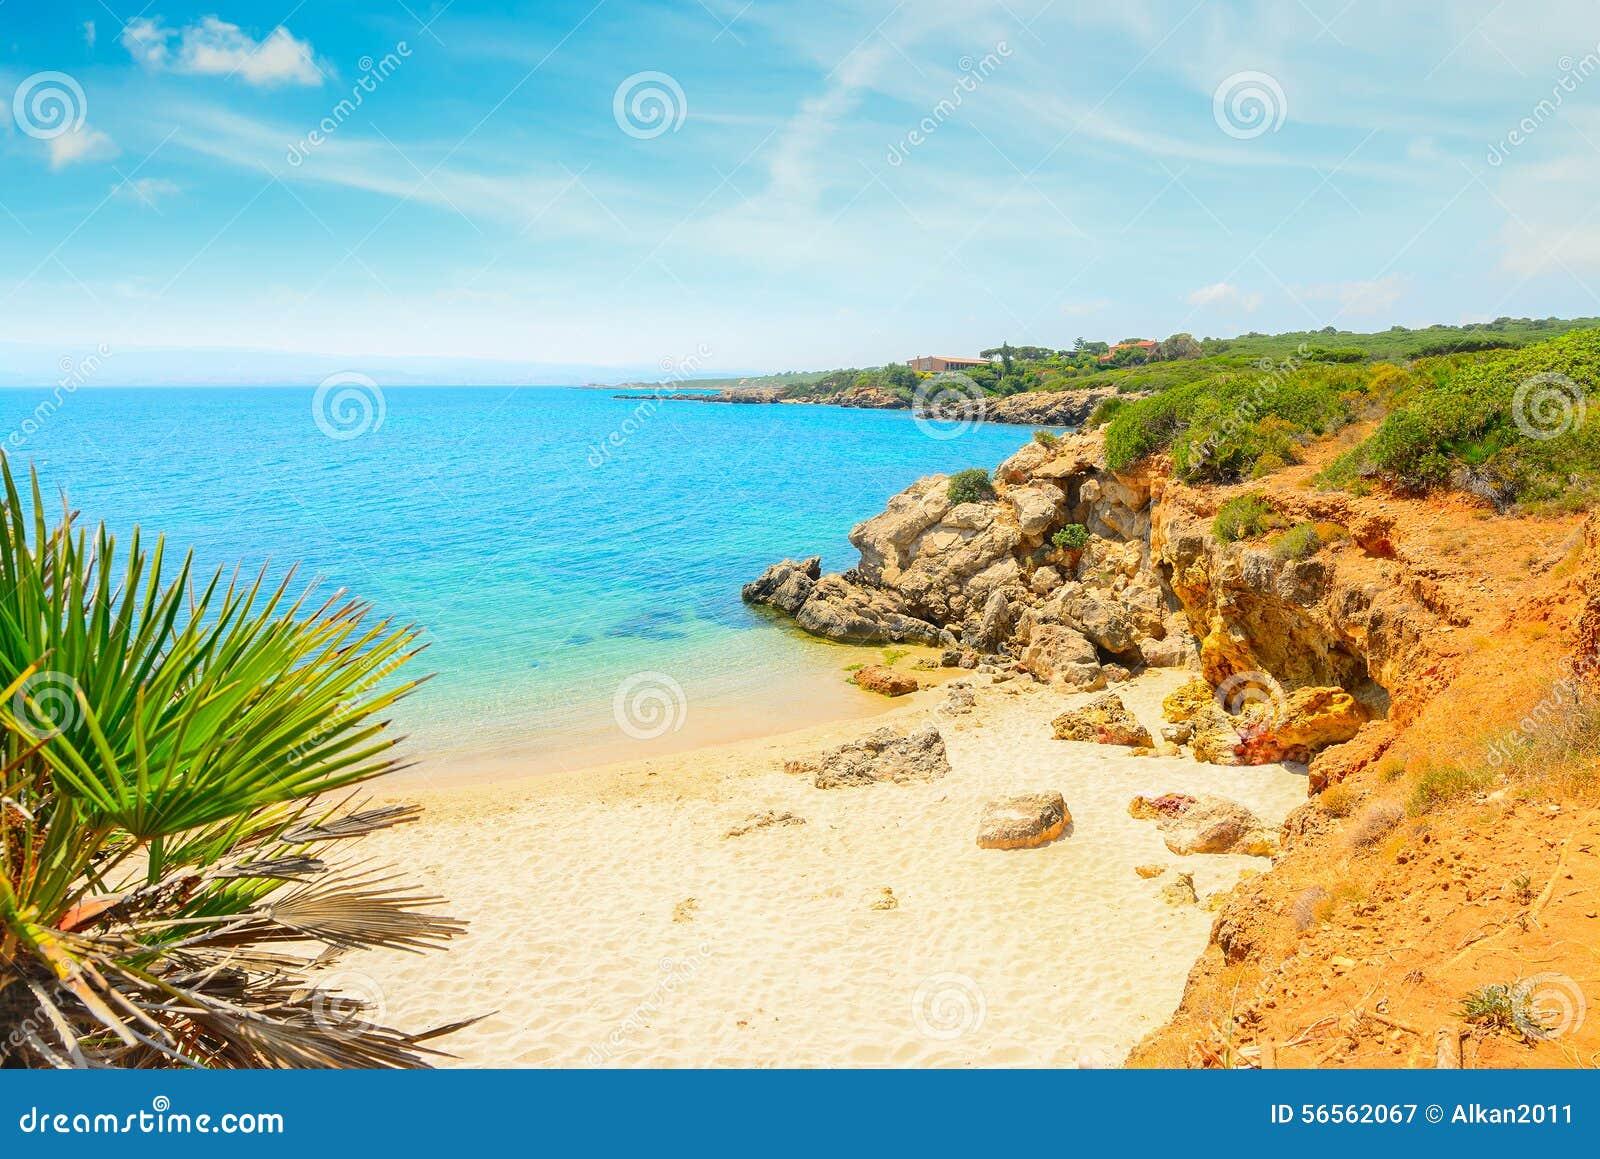 Download Μικρή παραλία κάτω από έναν νεφελώδη ουρανό στη Σαρδηνία Στοκ Εικόνα - εικόνα από ουρανός, άμμος: 56562067